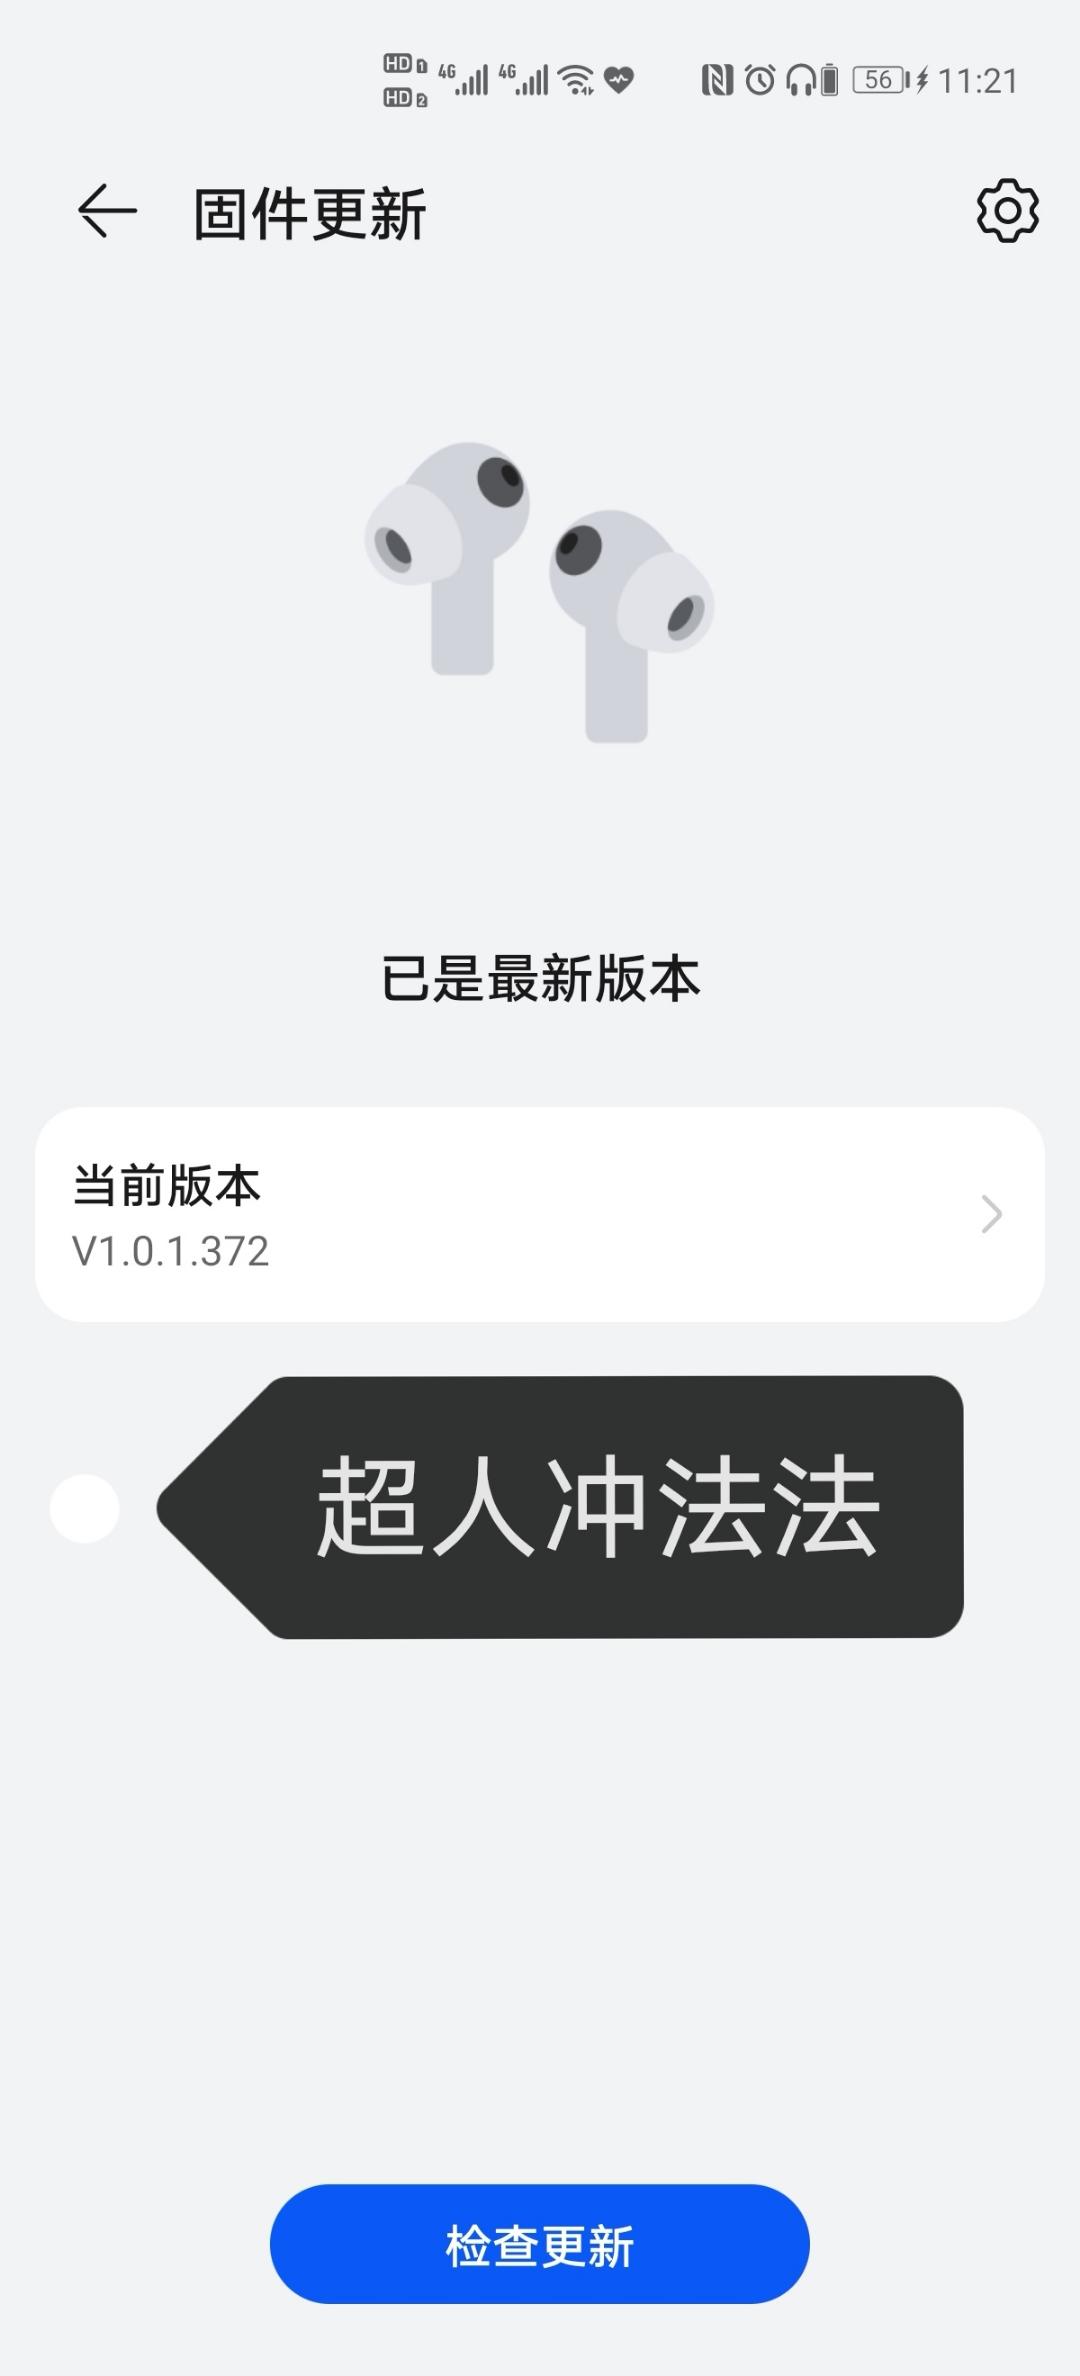 Screenshot_20210520_232153_com.huawei.smarthome_edit_1025221847708144.jpg